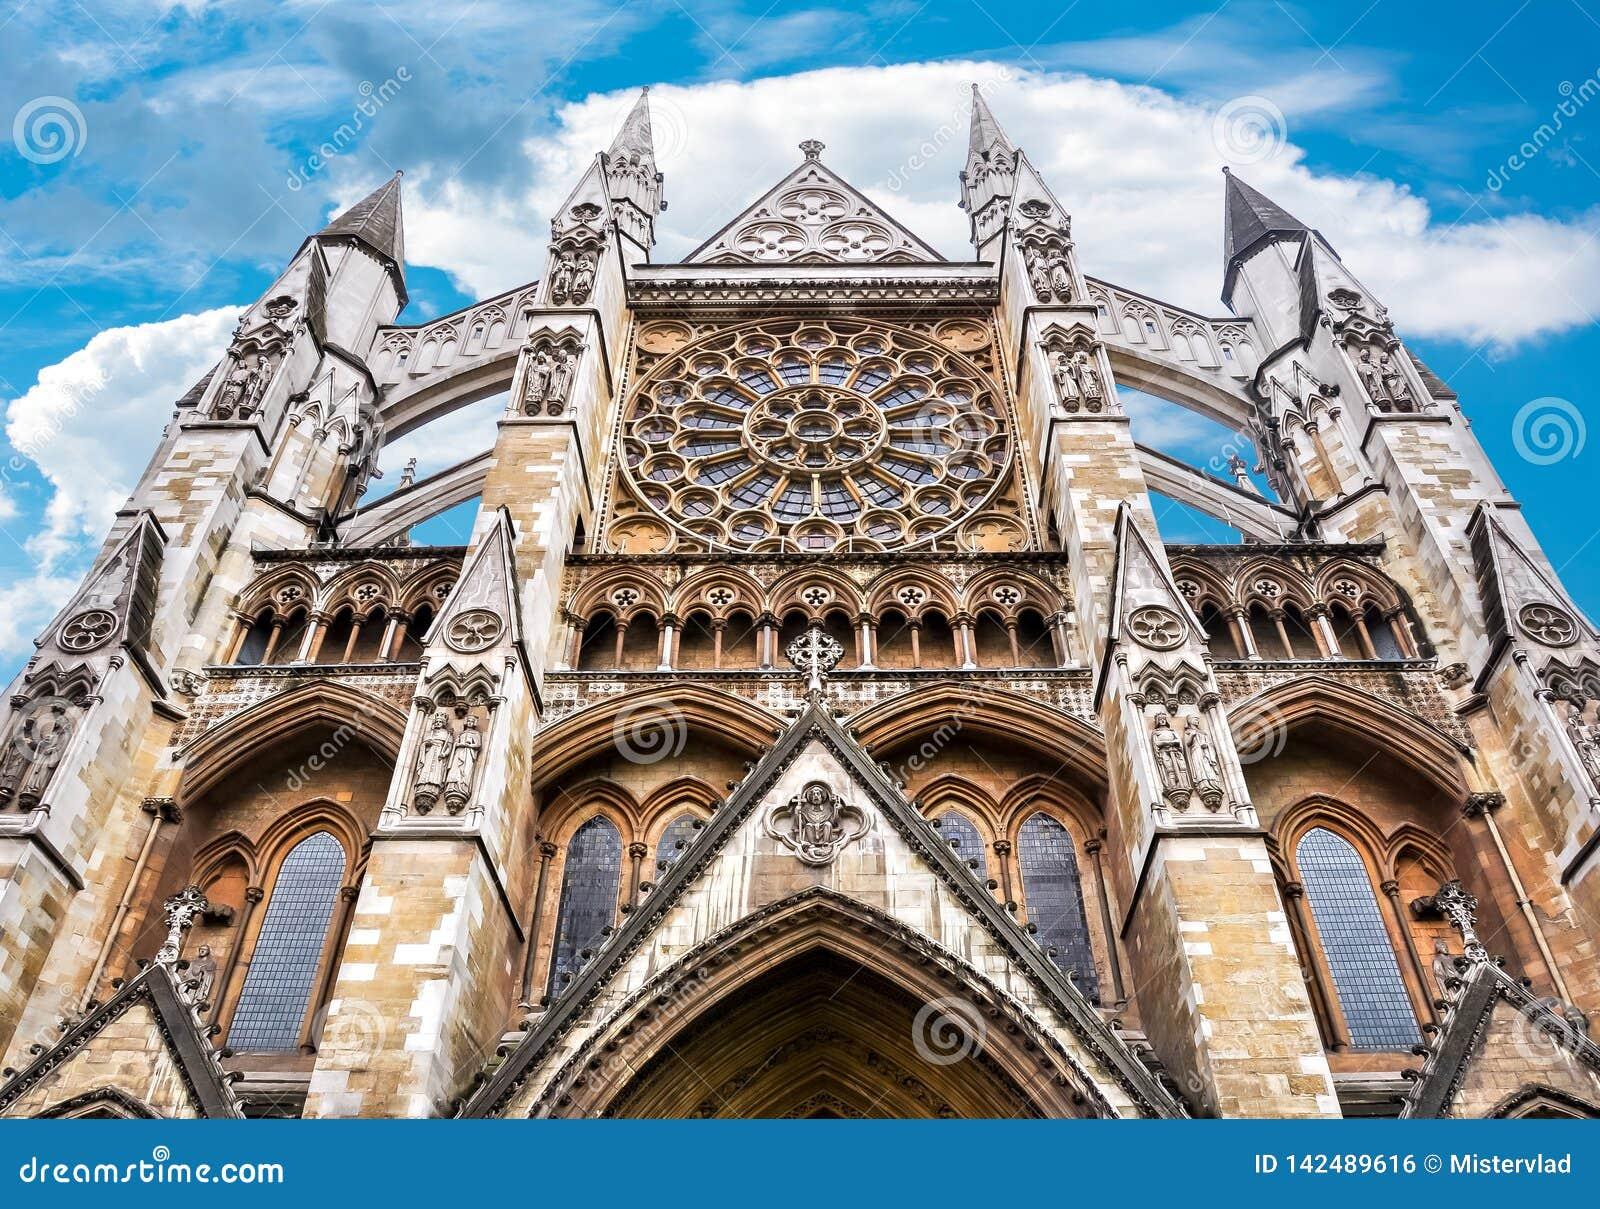 Westminster Abbey facade, London, UK